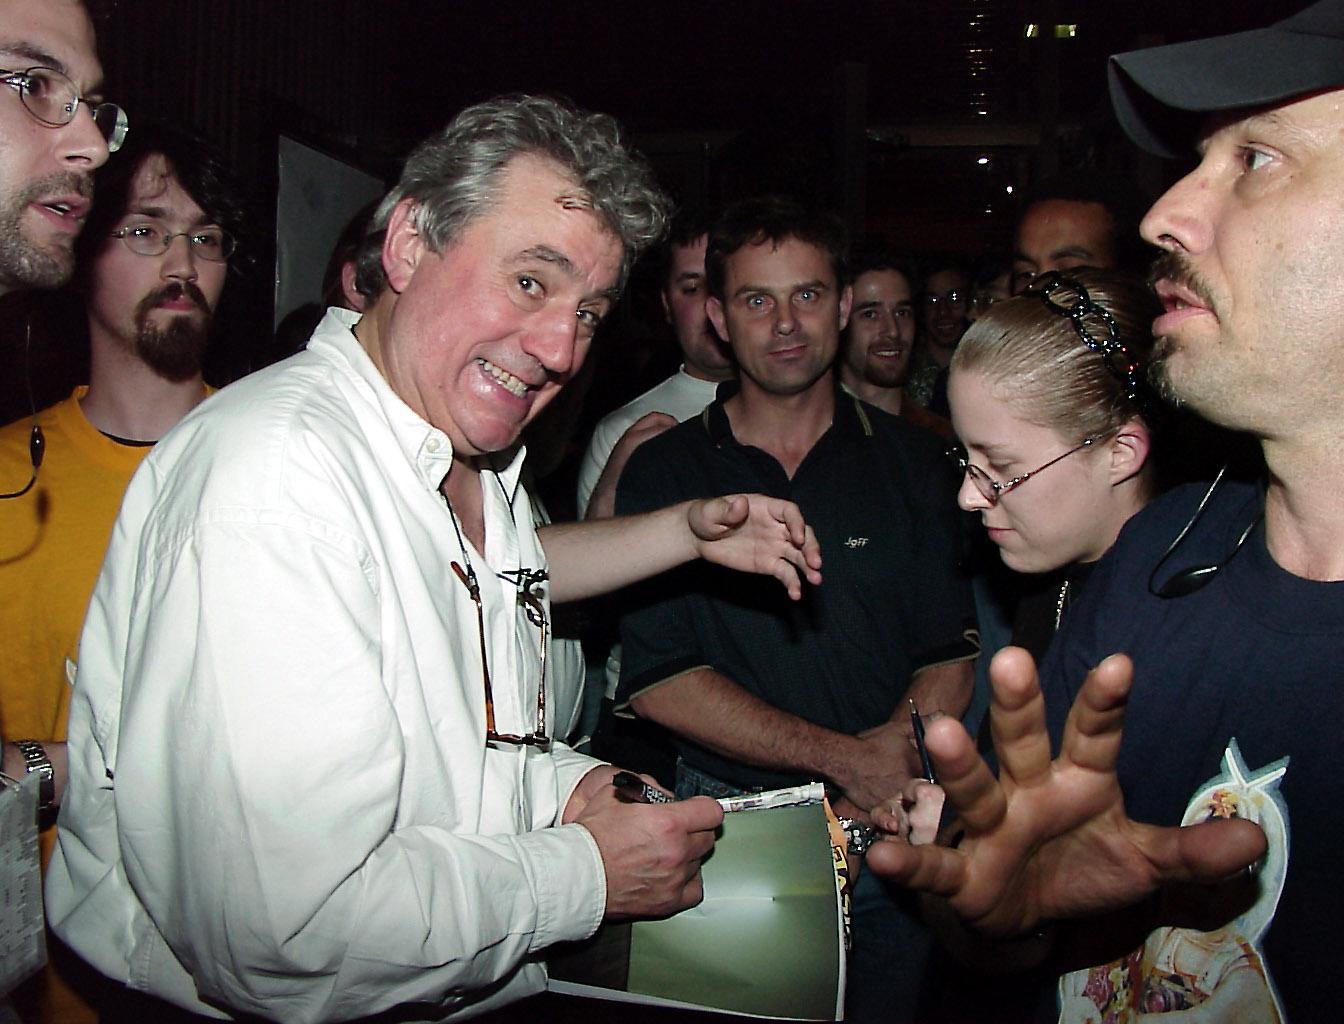 Former Monty Python Terry Jones